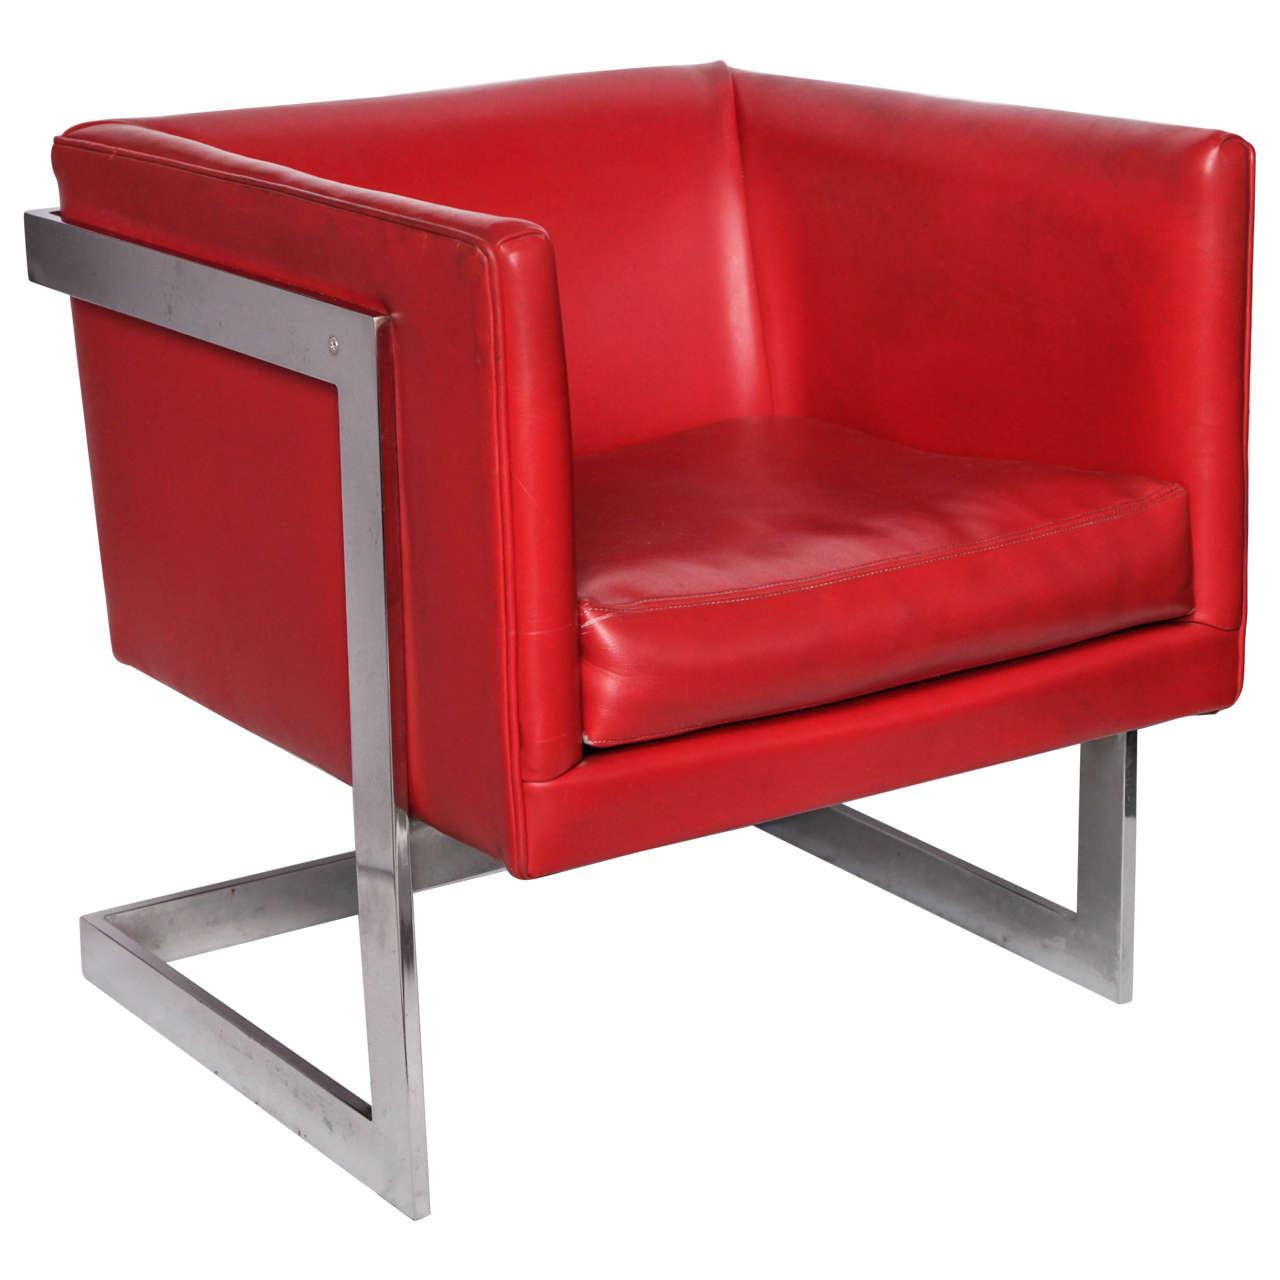 1970s Modernist Cube Chair by Milo Baughman